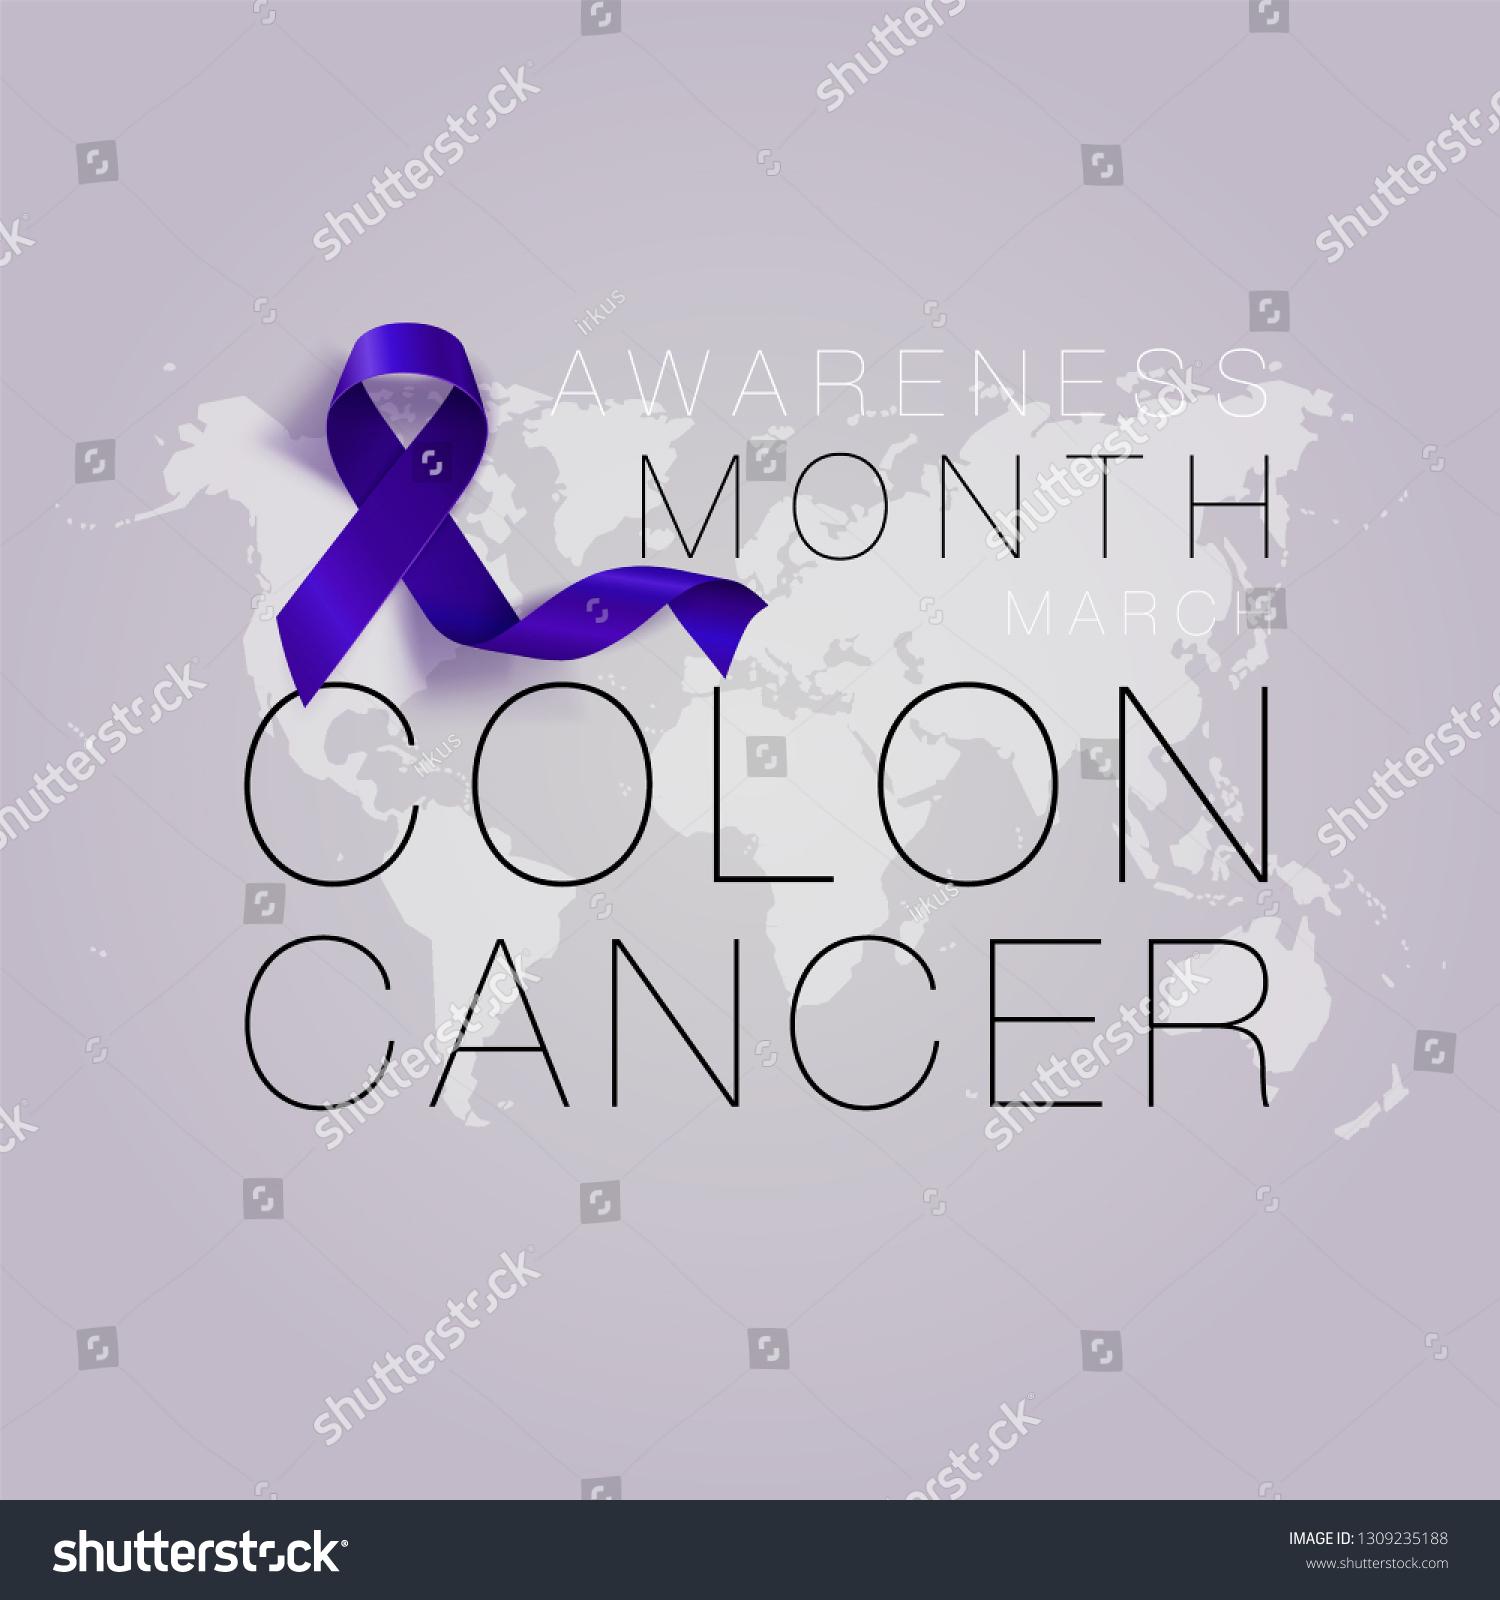 Colon Cancer Awareness Calligraphy Poster Design Stock Vector Royalty Free 1309235188